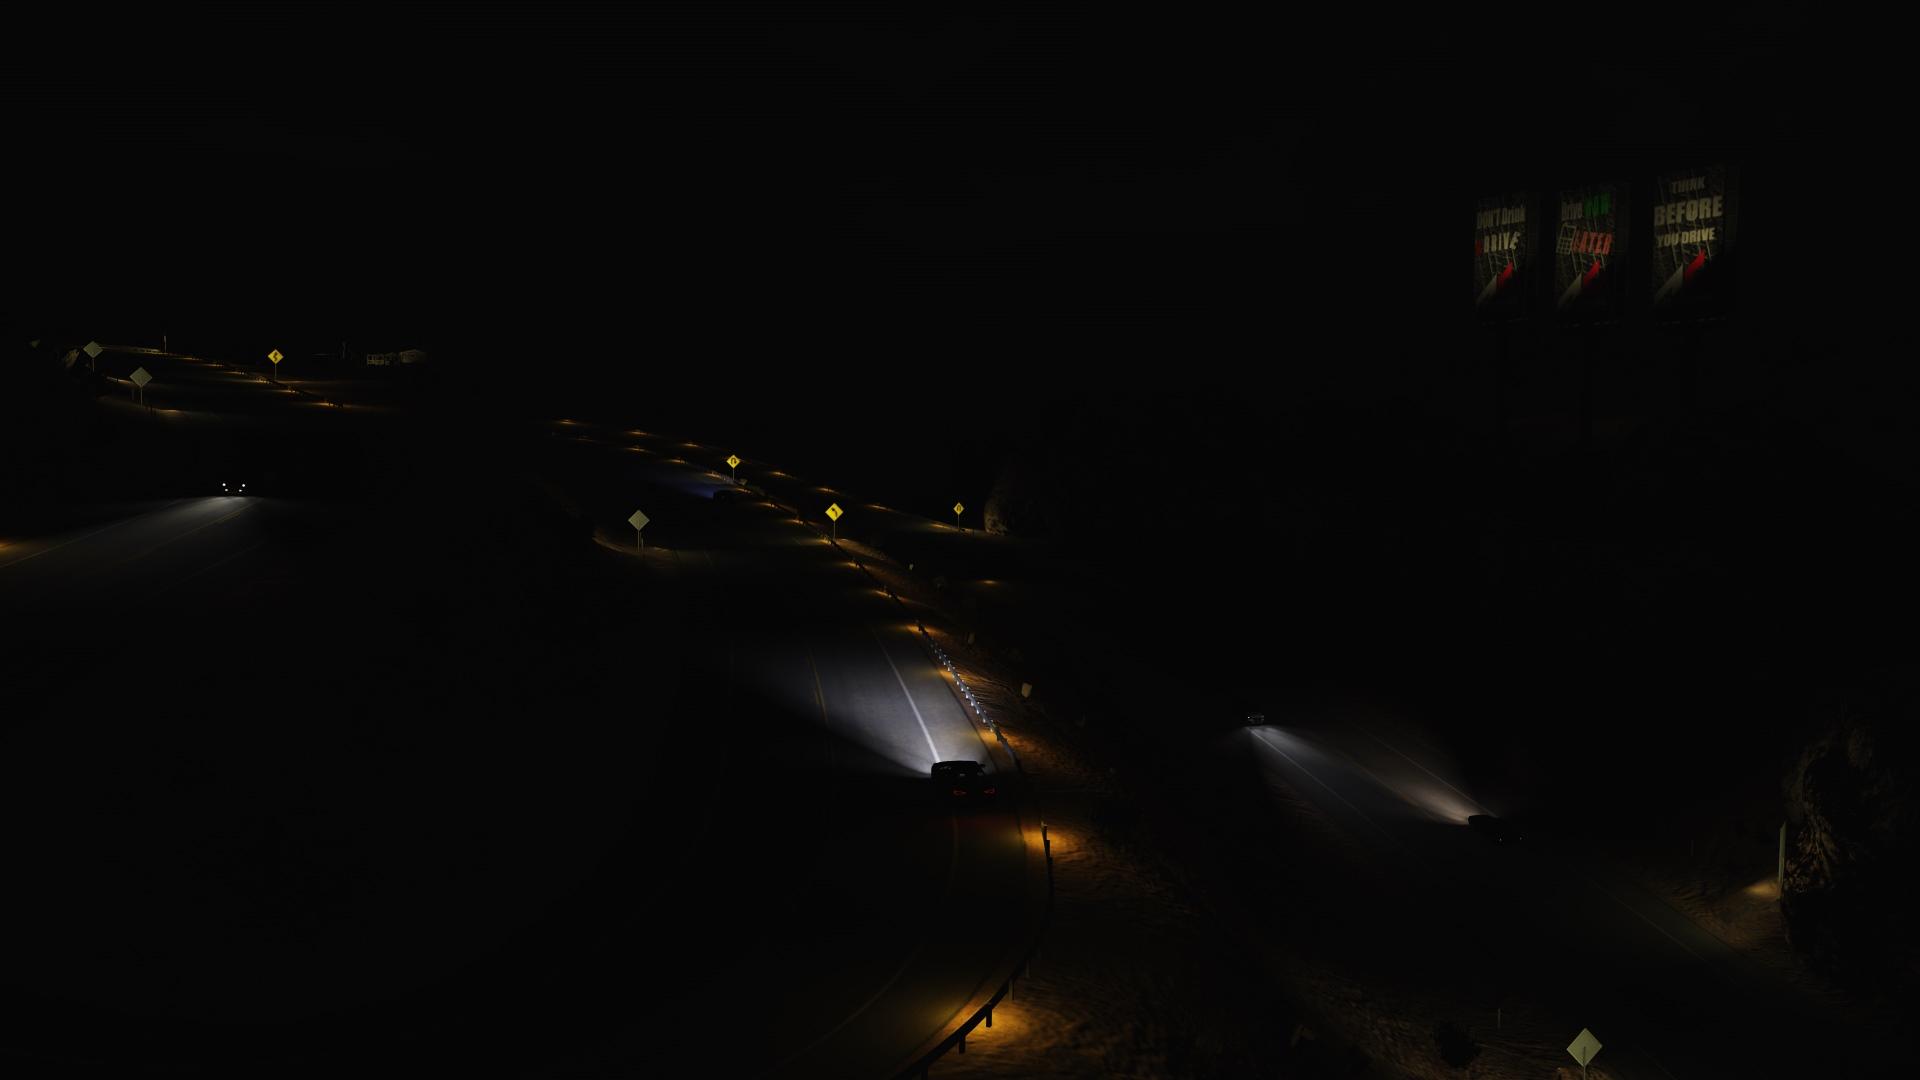 Screenshot_ks_maserati_quattroporte_ks_black_cat_county_24-10-119-14-45-58.jpg